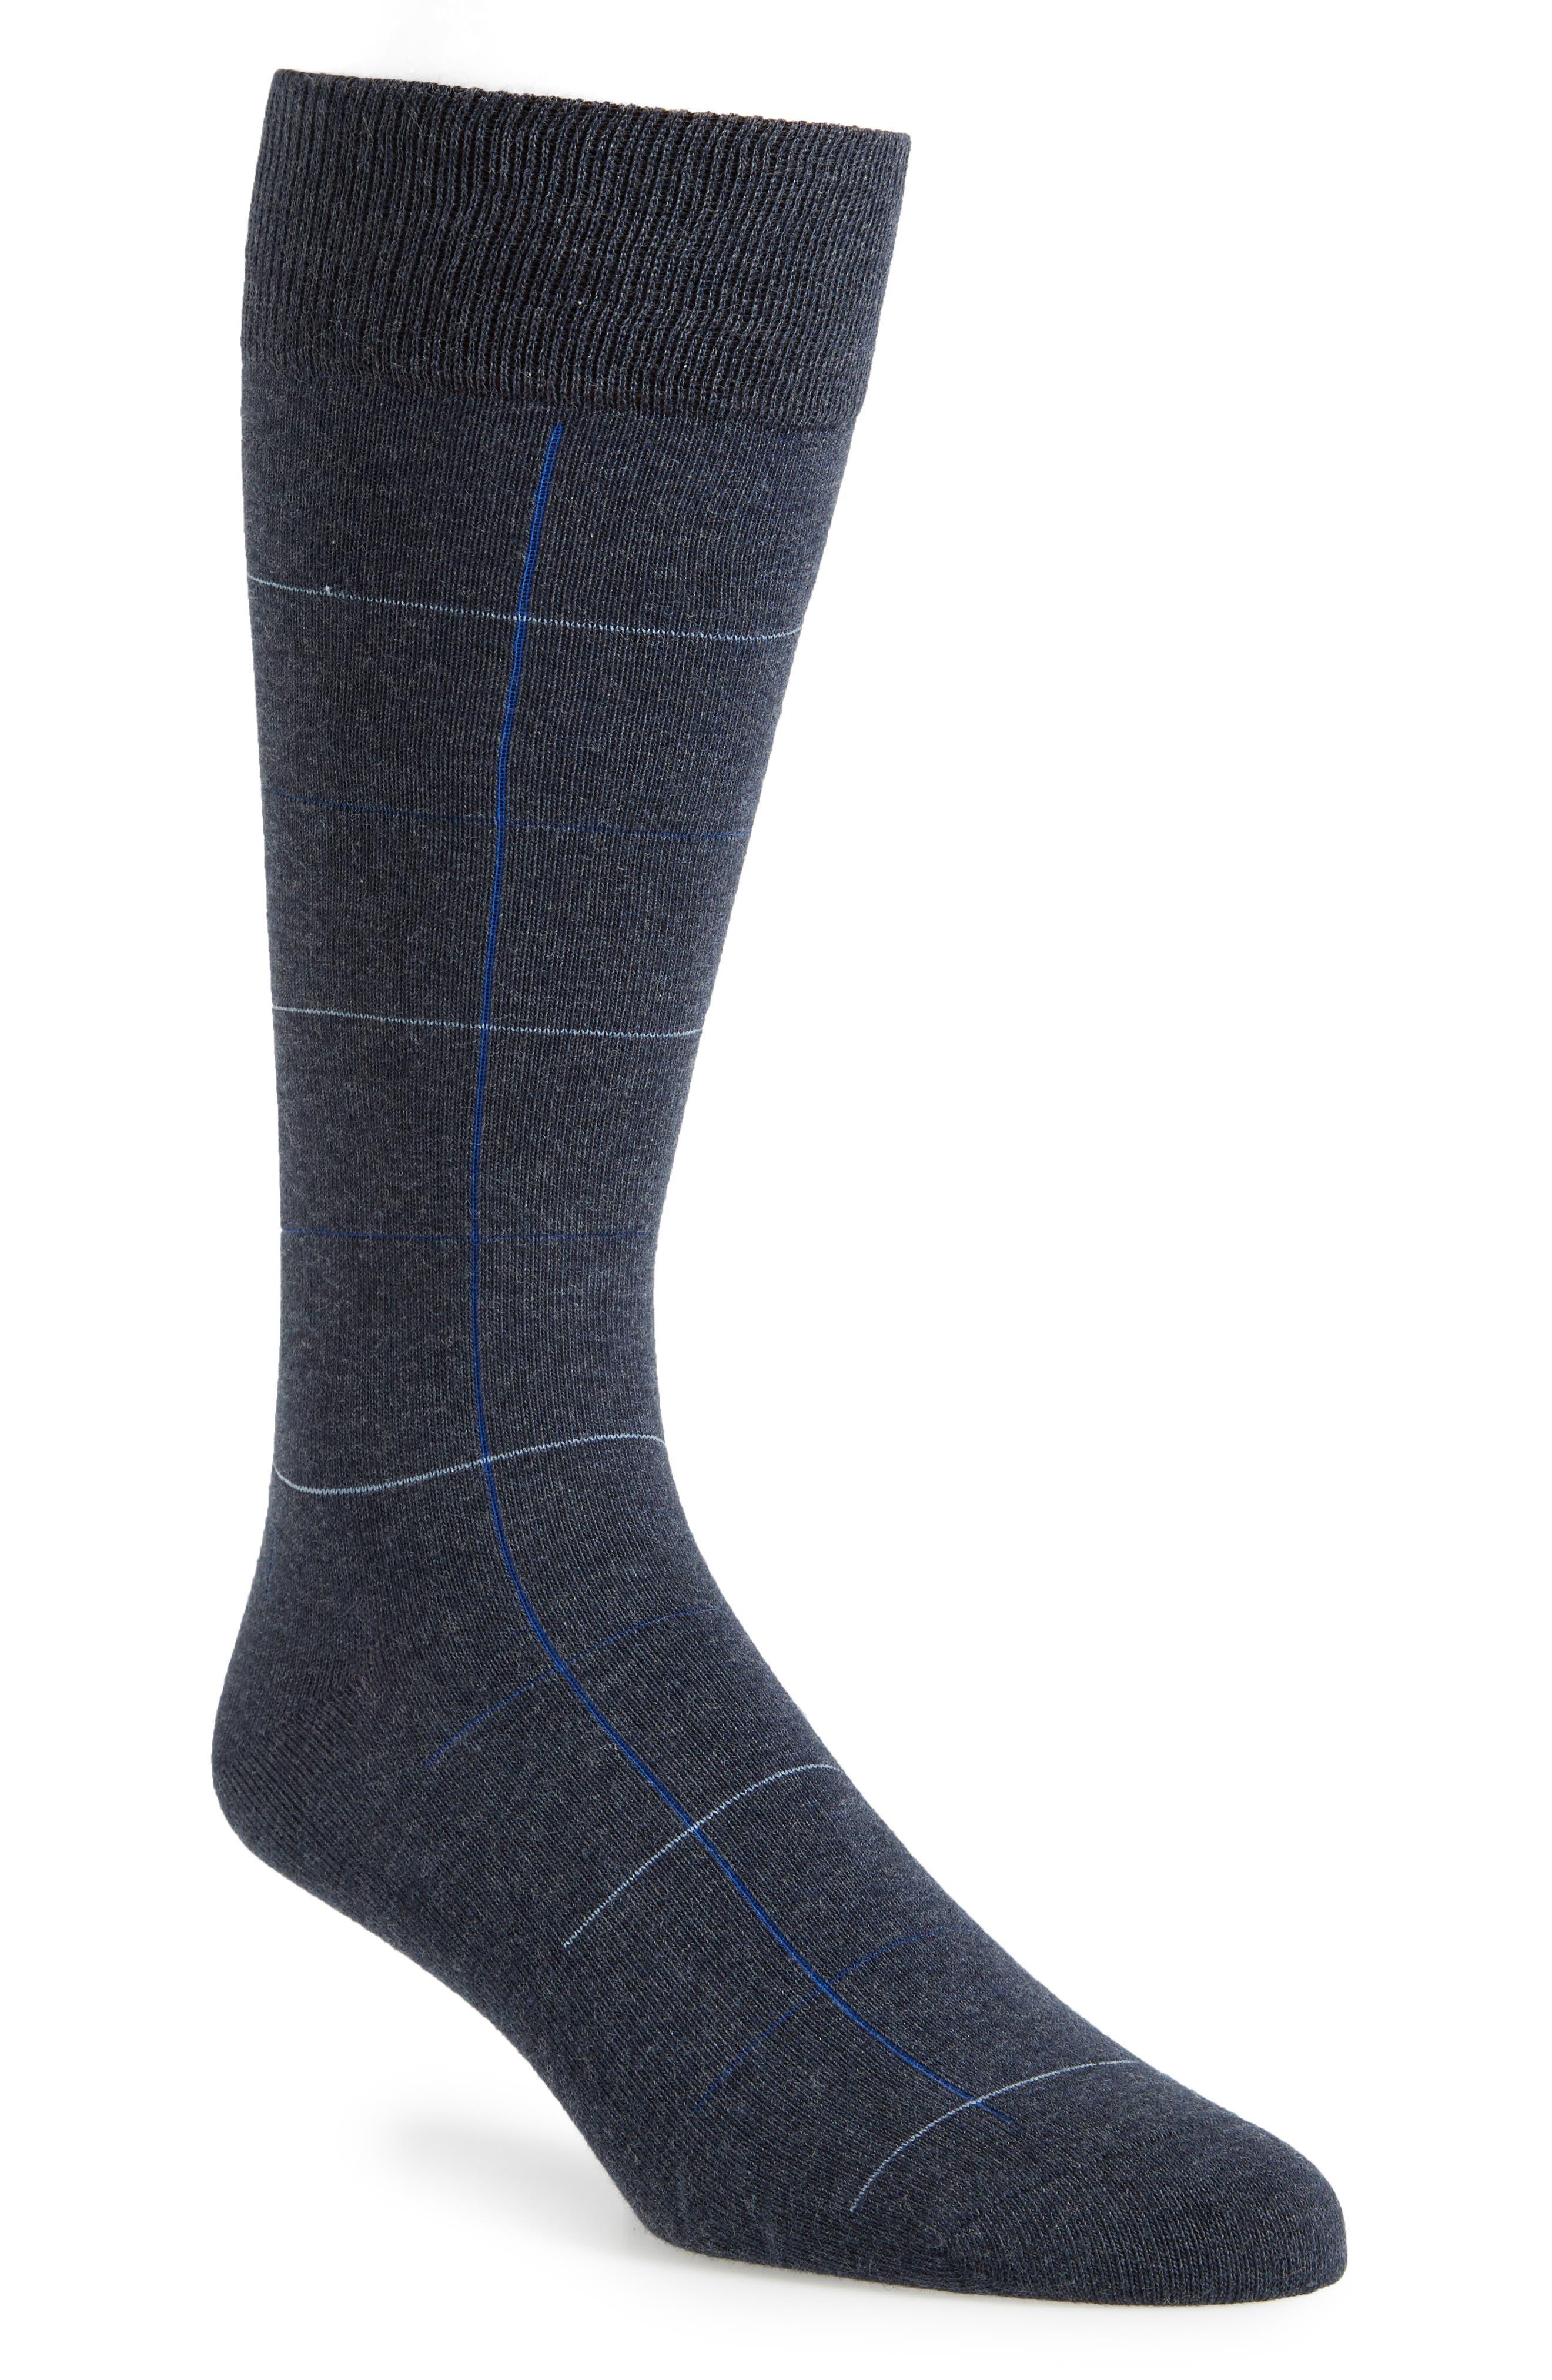 Check Socks,                         Main,                         color, Navy Heather